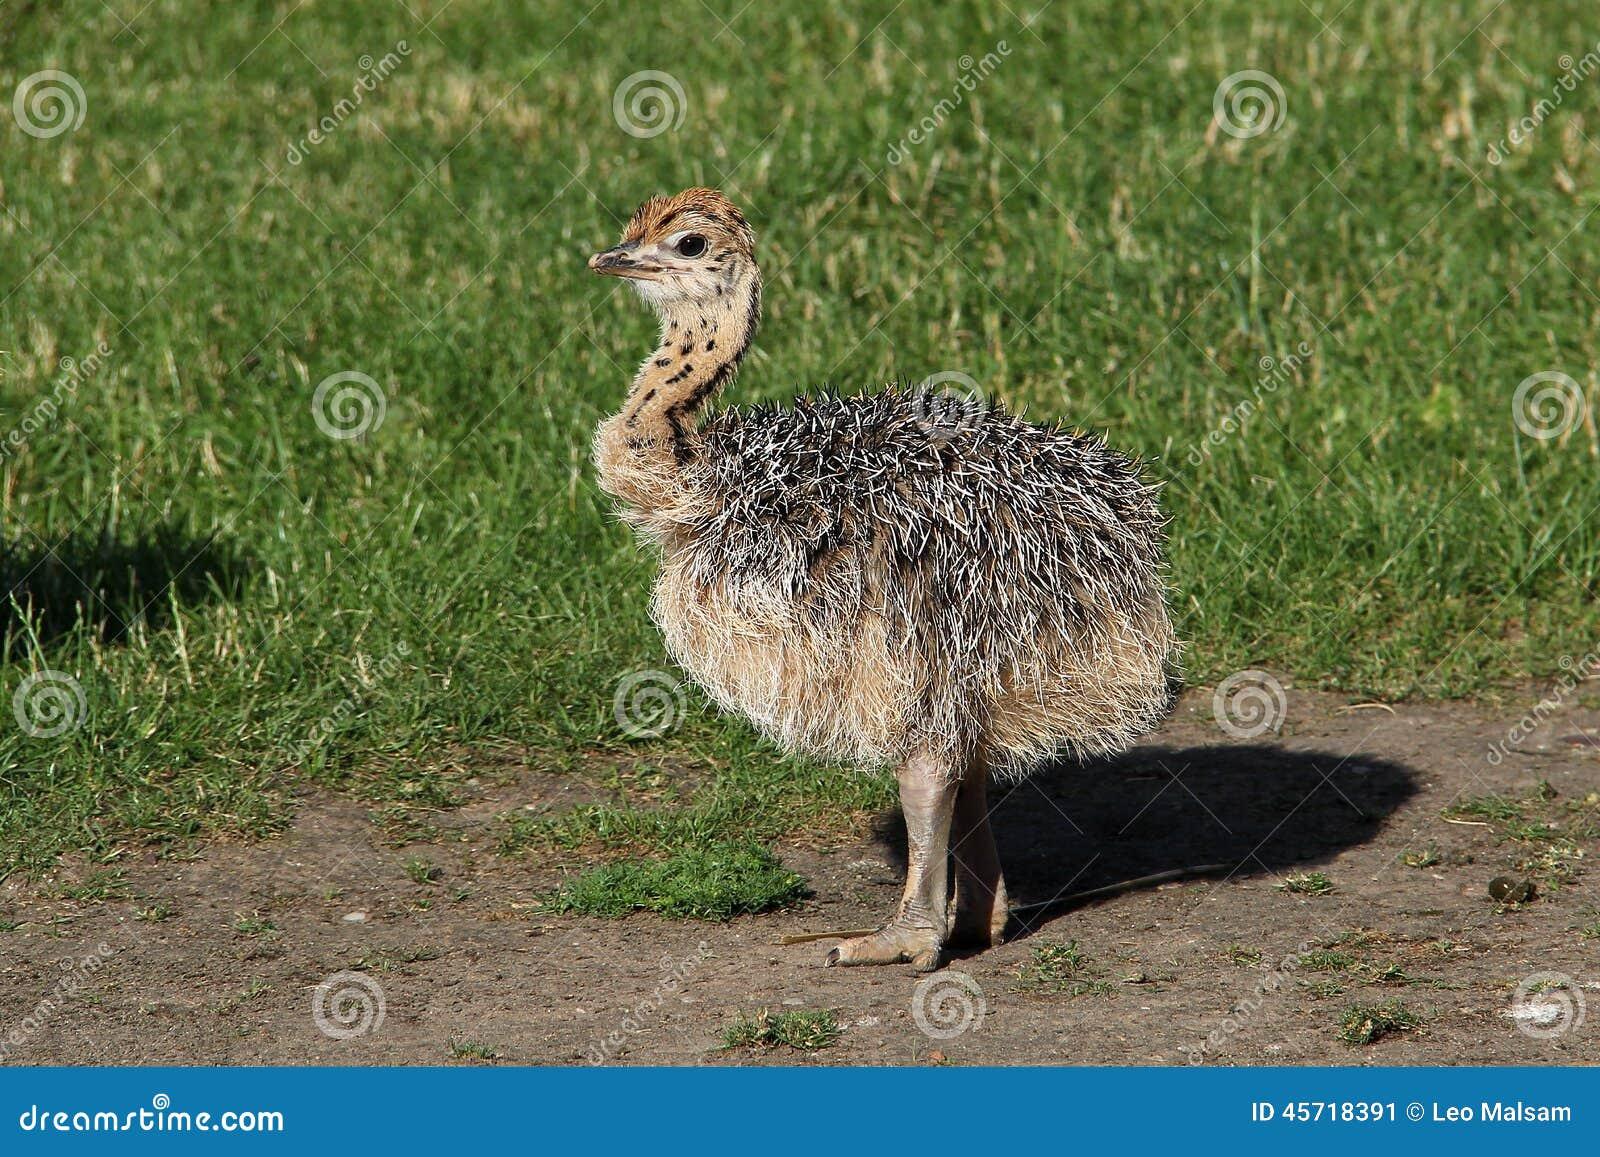 Small ostrich